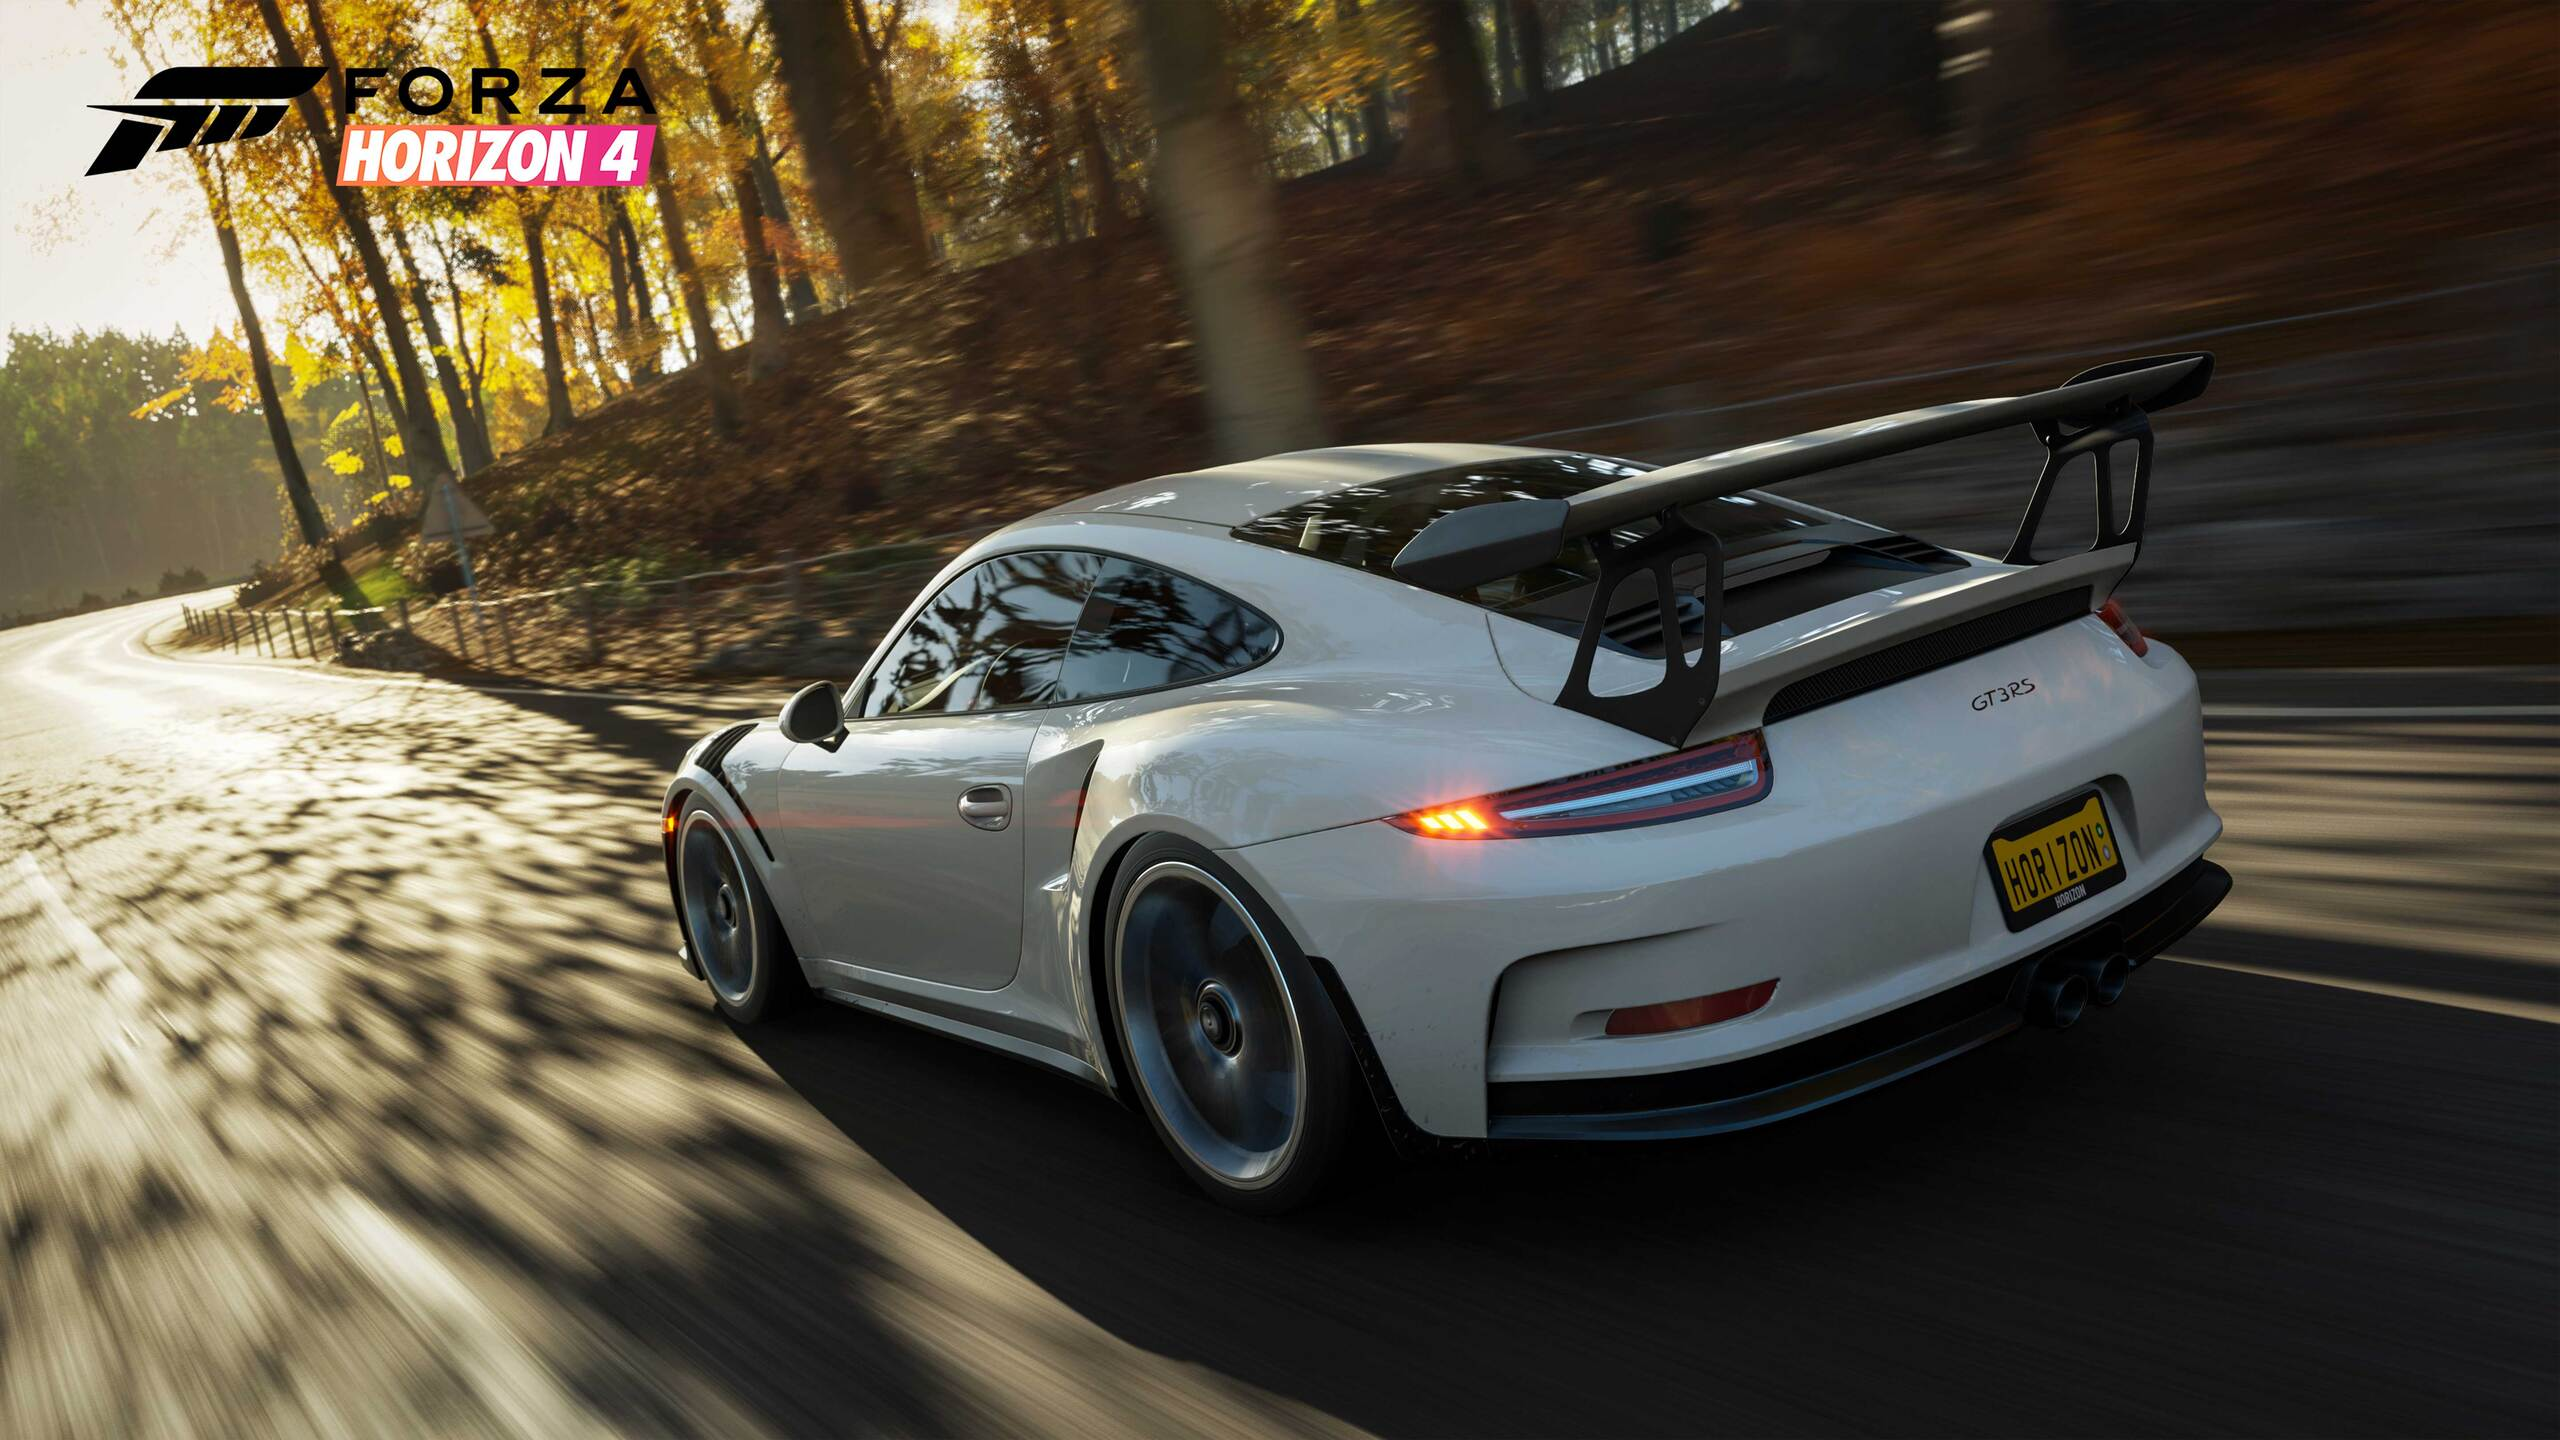 Forza Horizon 4 Wallpaper: 2560x1440 Forza Horizon 4 GT3 RS 5k 1440P Resolution HD 4k